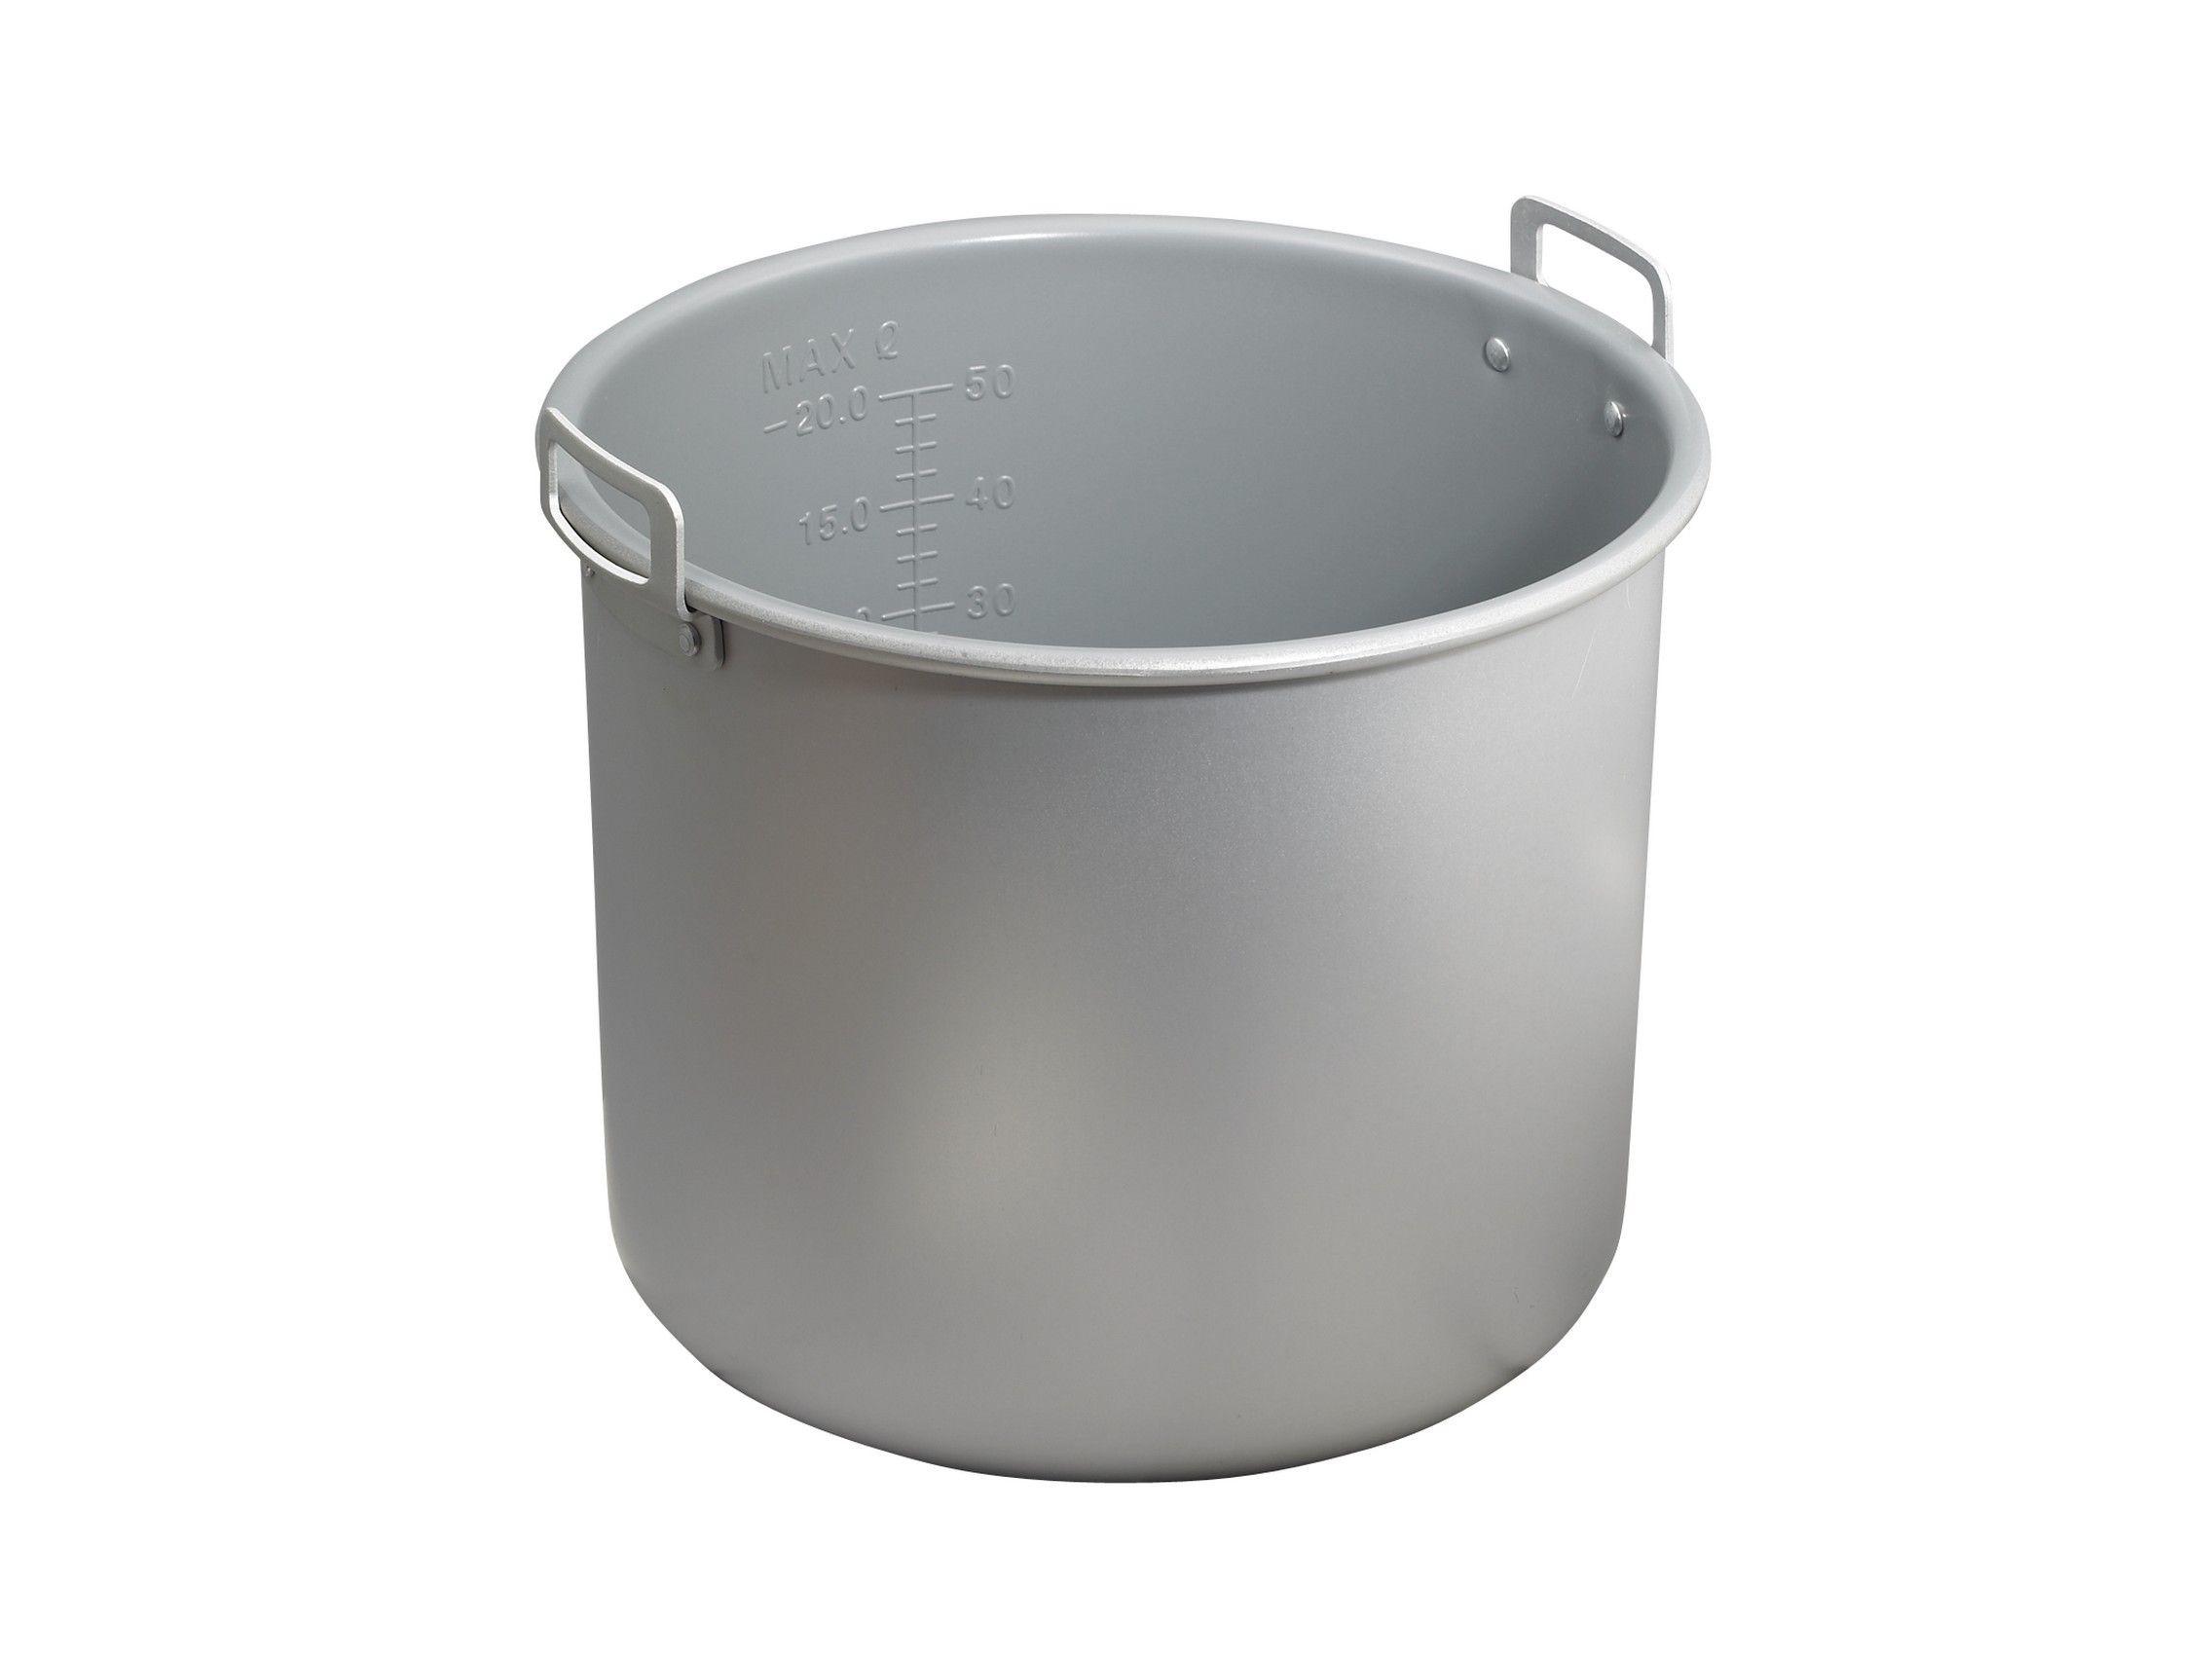 Winco RW-450P Inner Pot for RW-S450